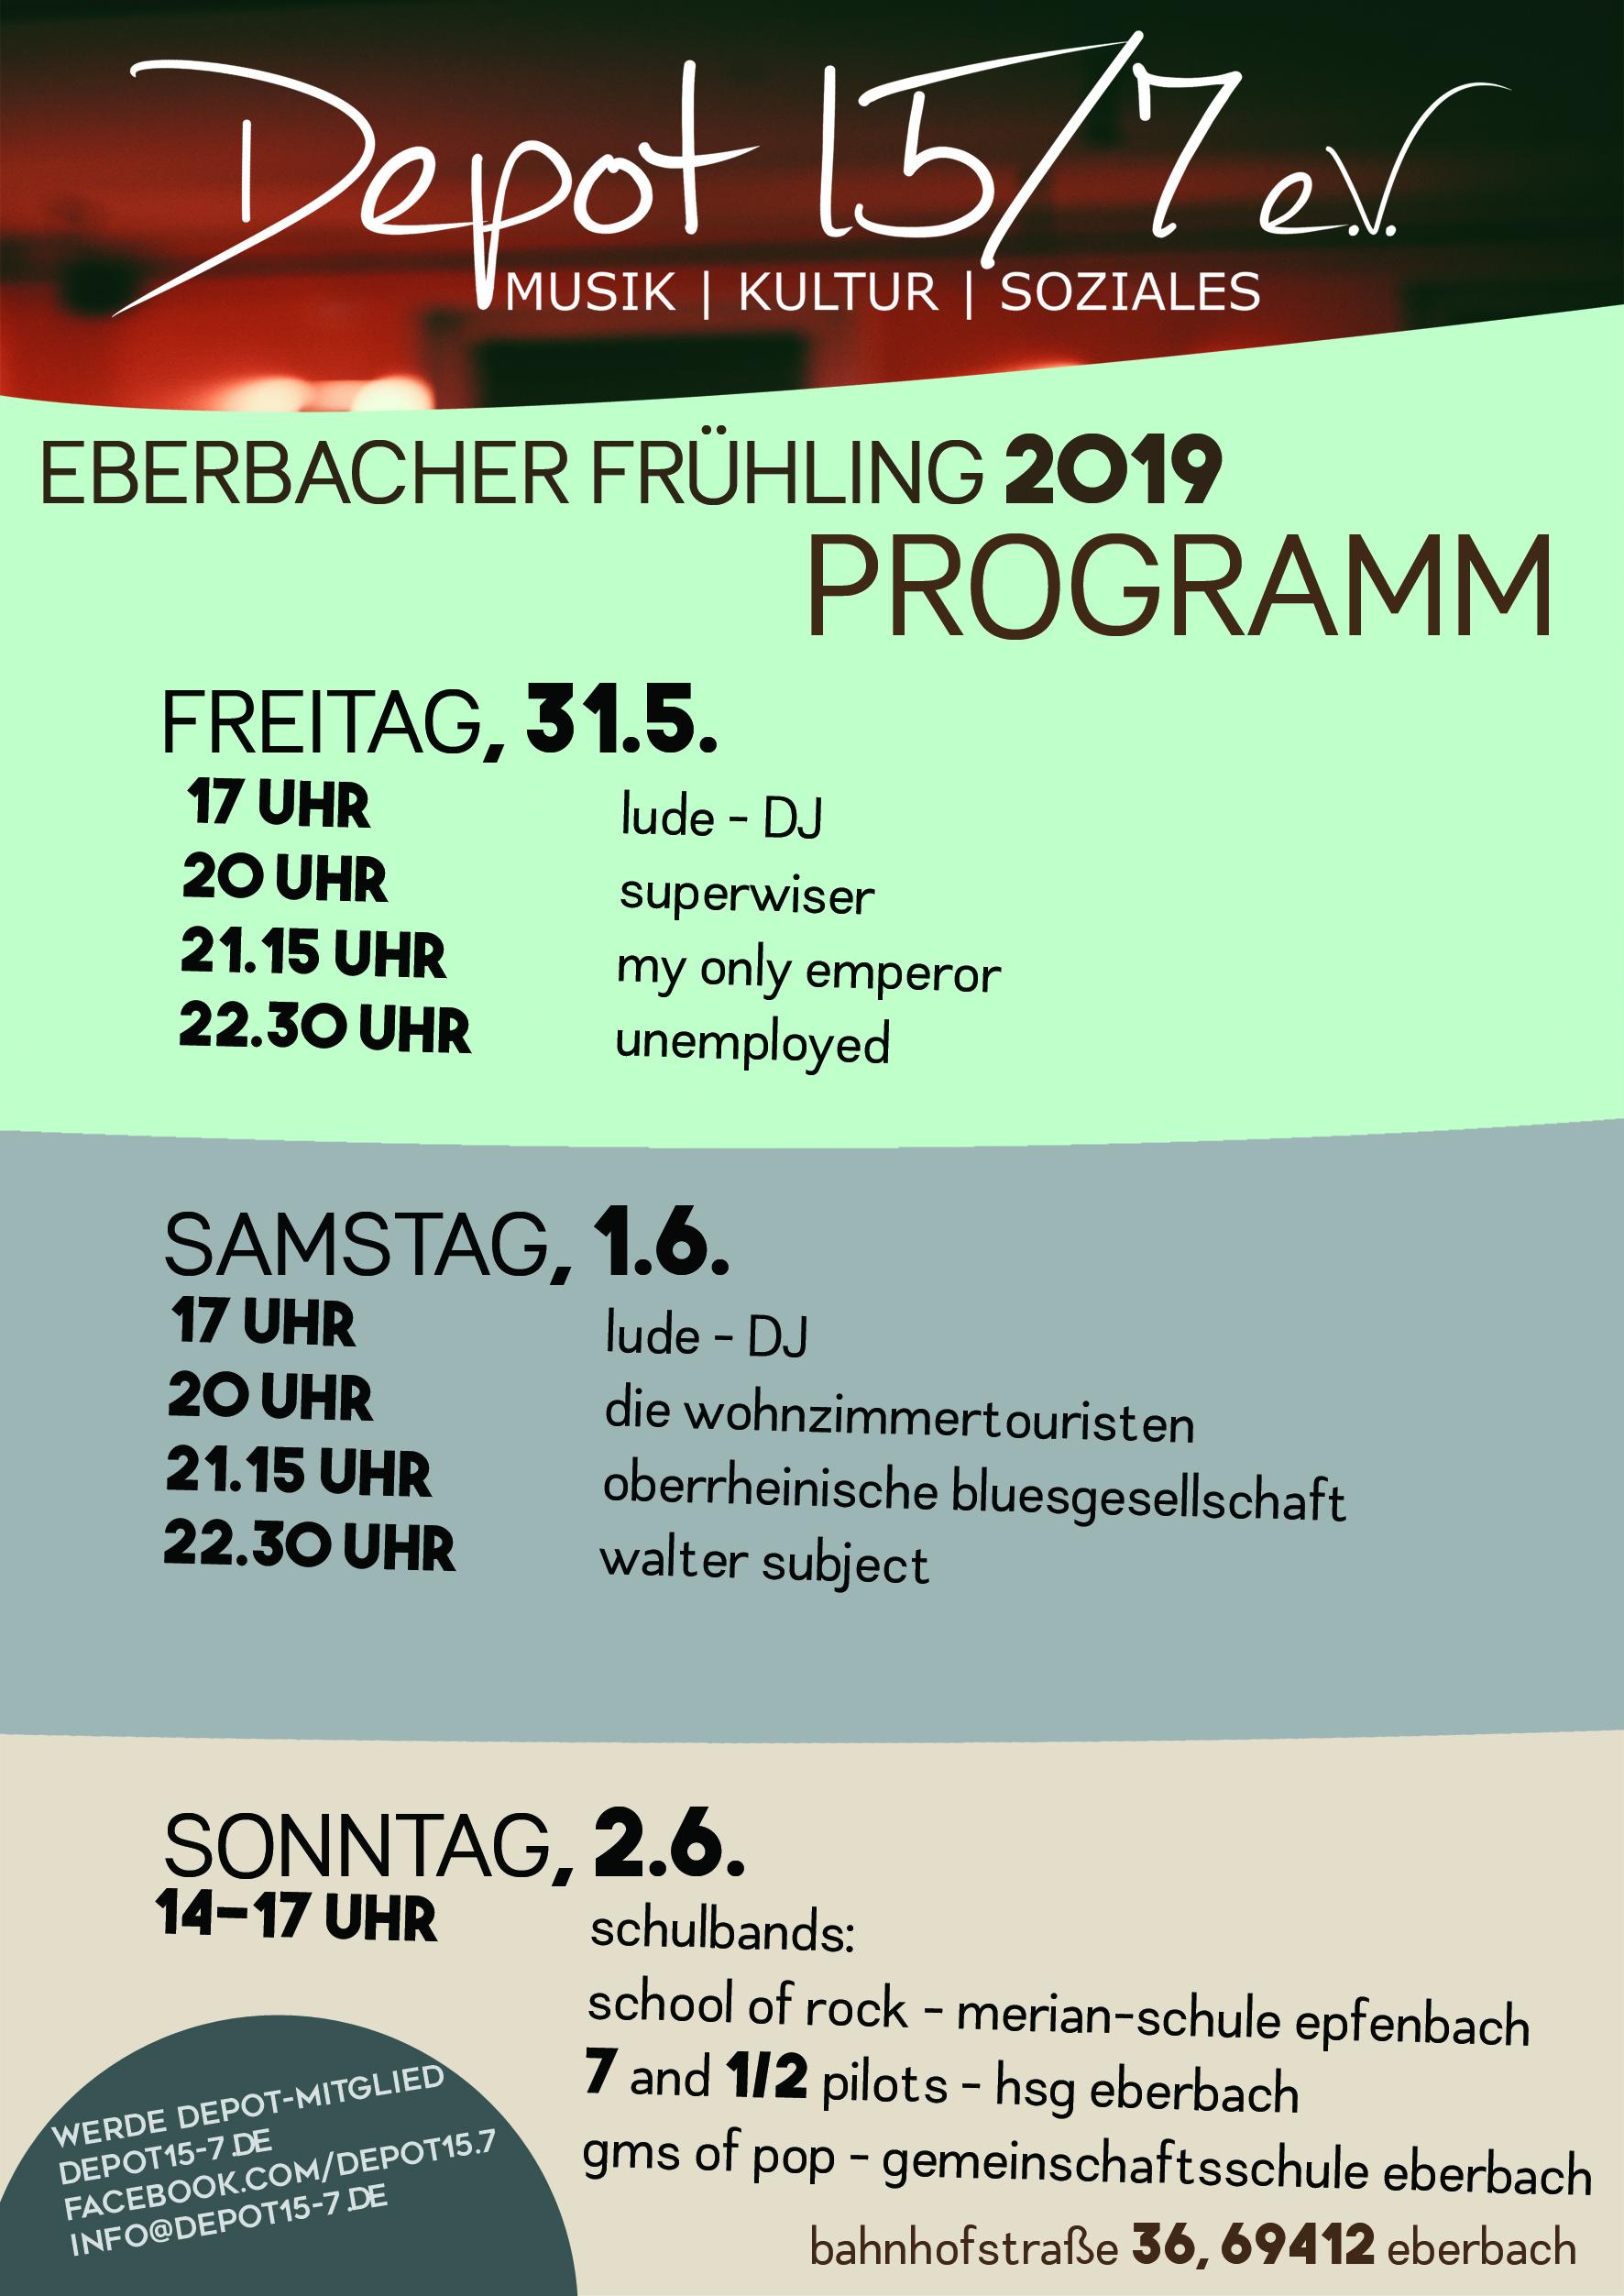 Frühlingsfest Flyer Facebook 2019.JPG